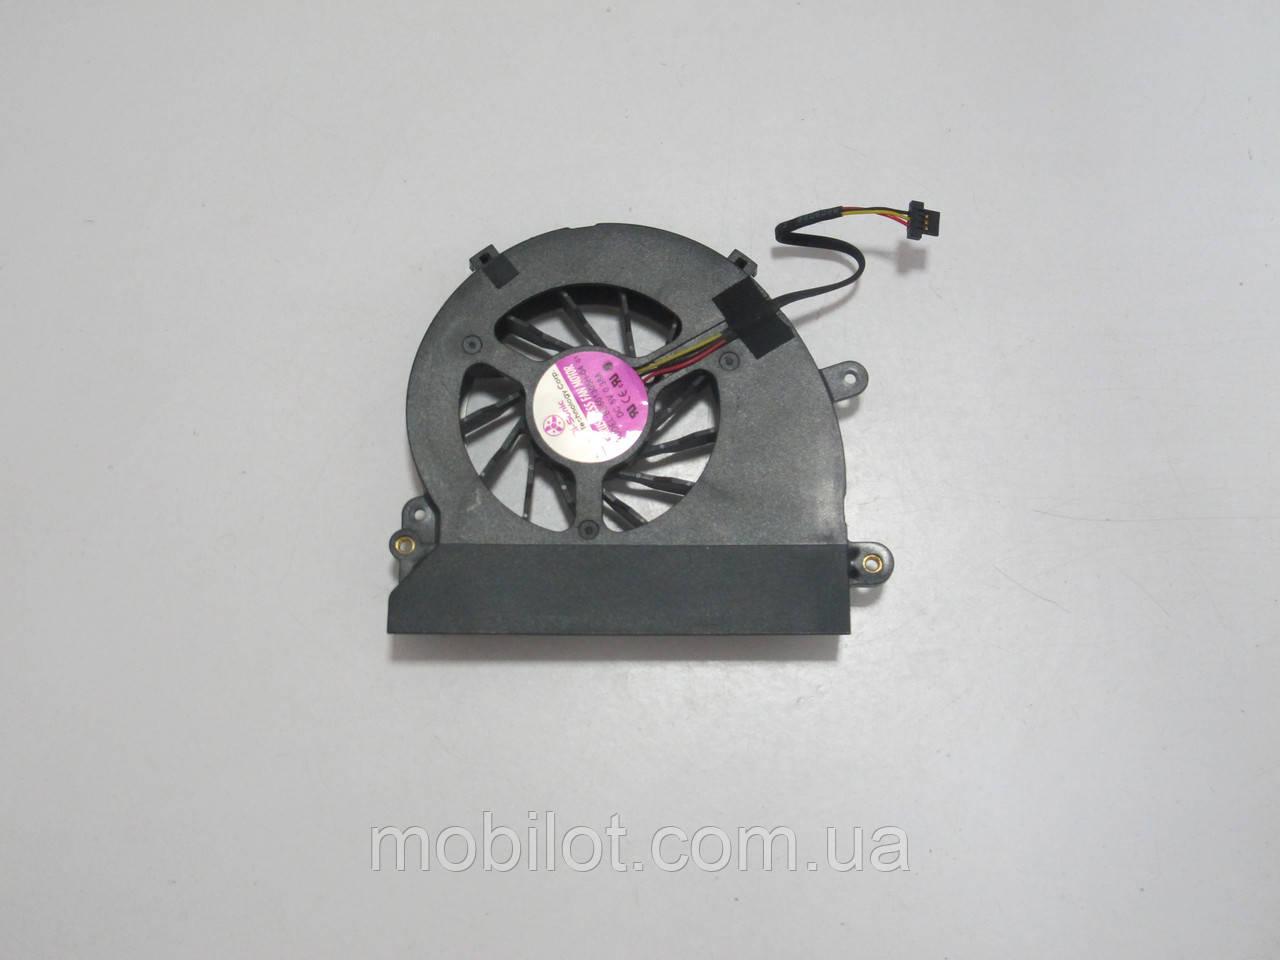 Система охлаждения (кулер) Fujitsu Amilo Xi2528 (NZ-6652)